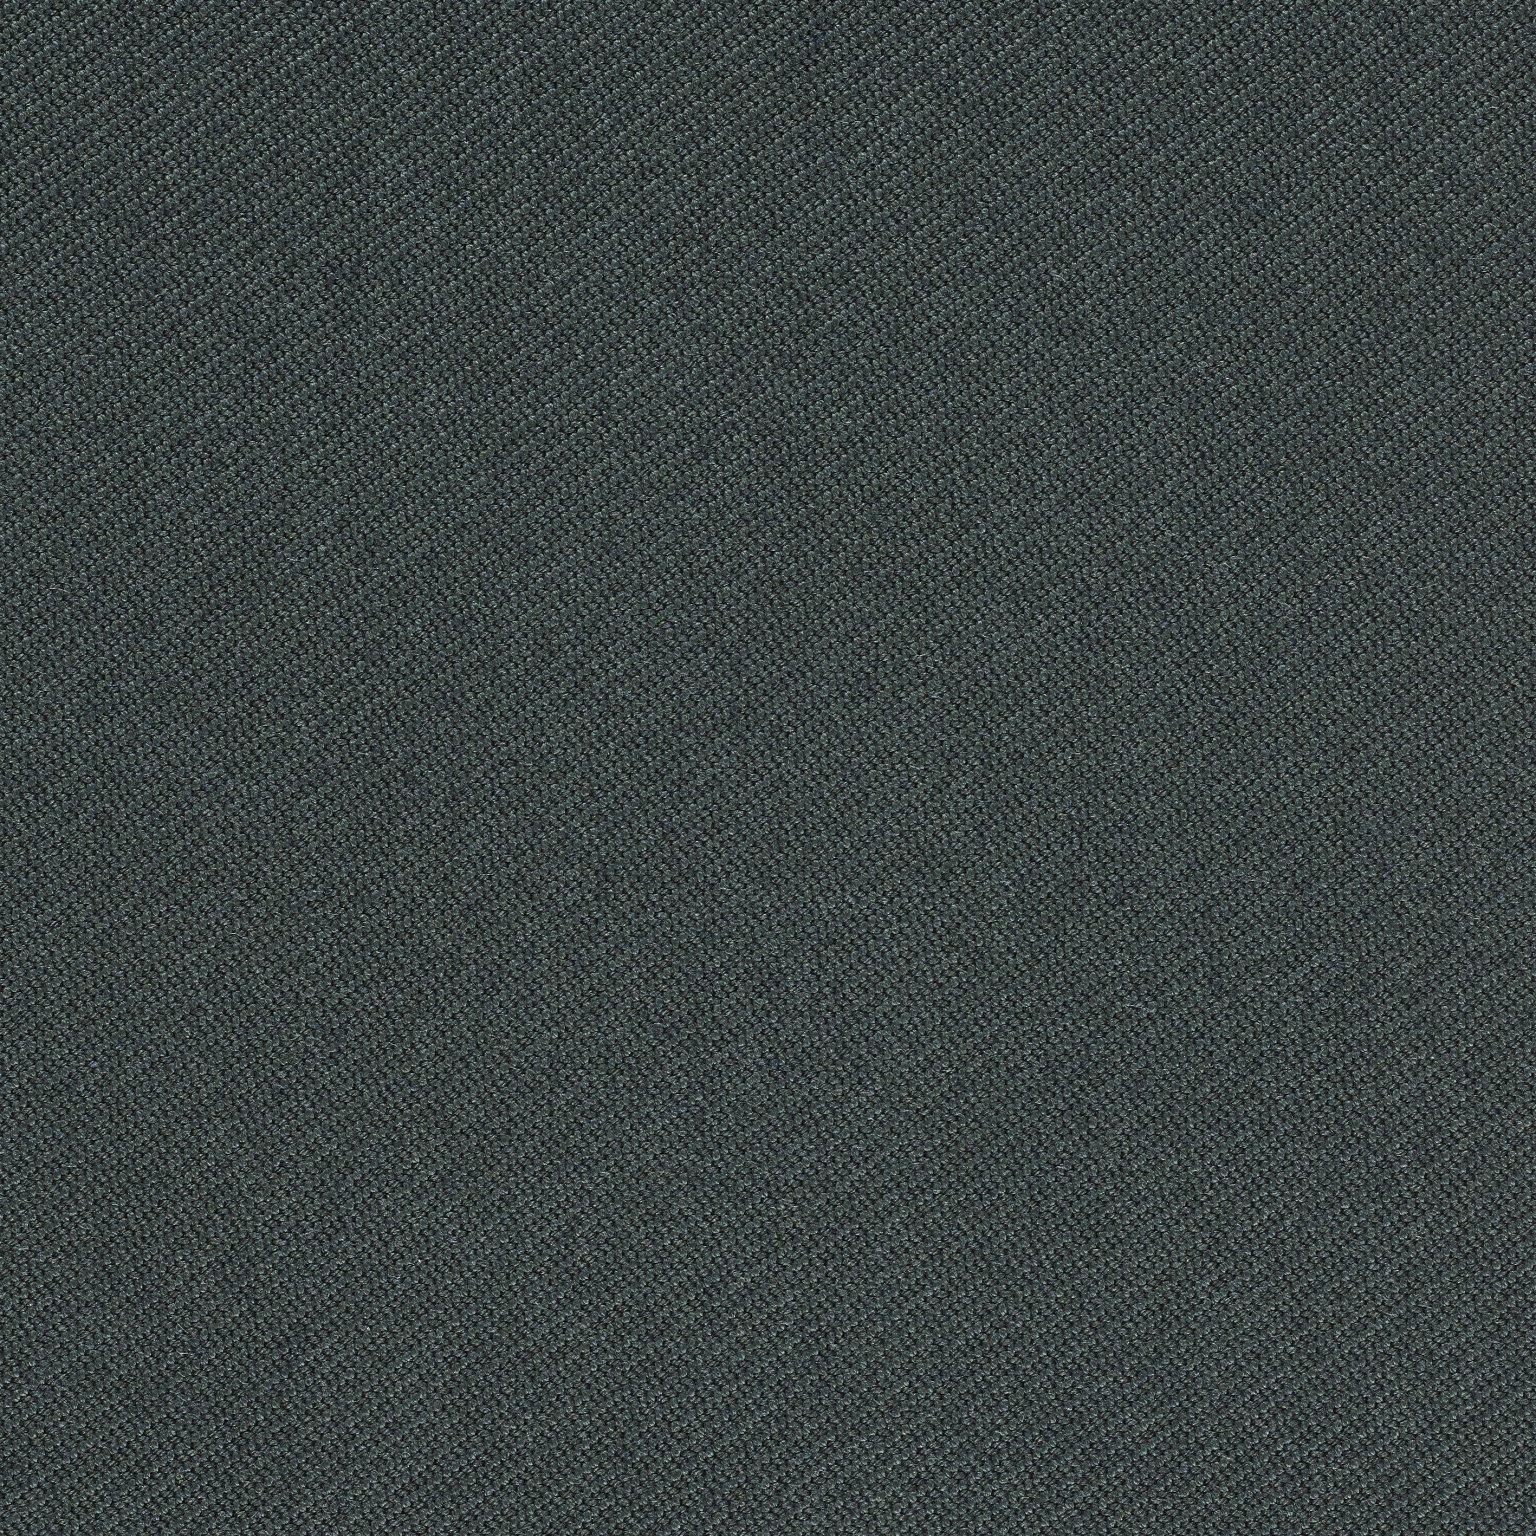 Kvadrat > Twill Weave 0990